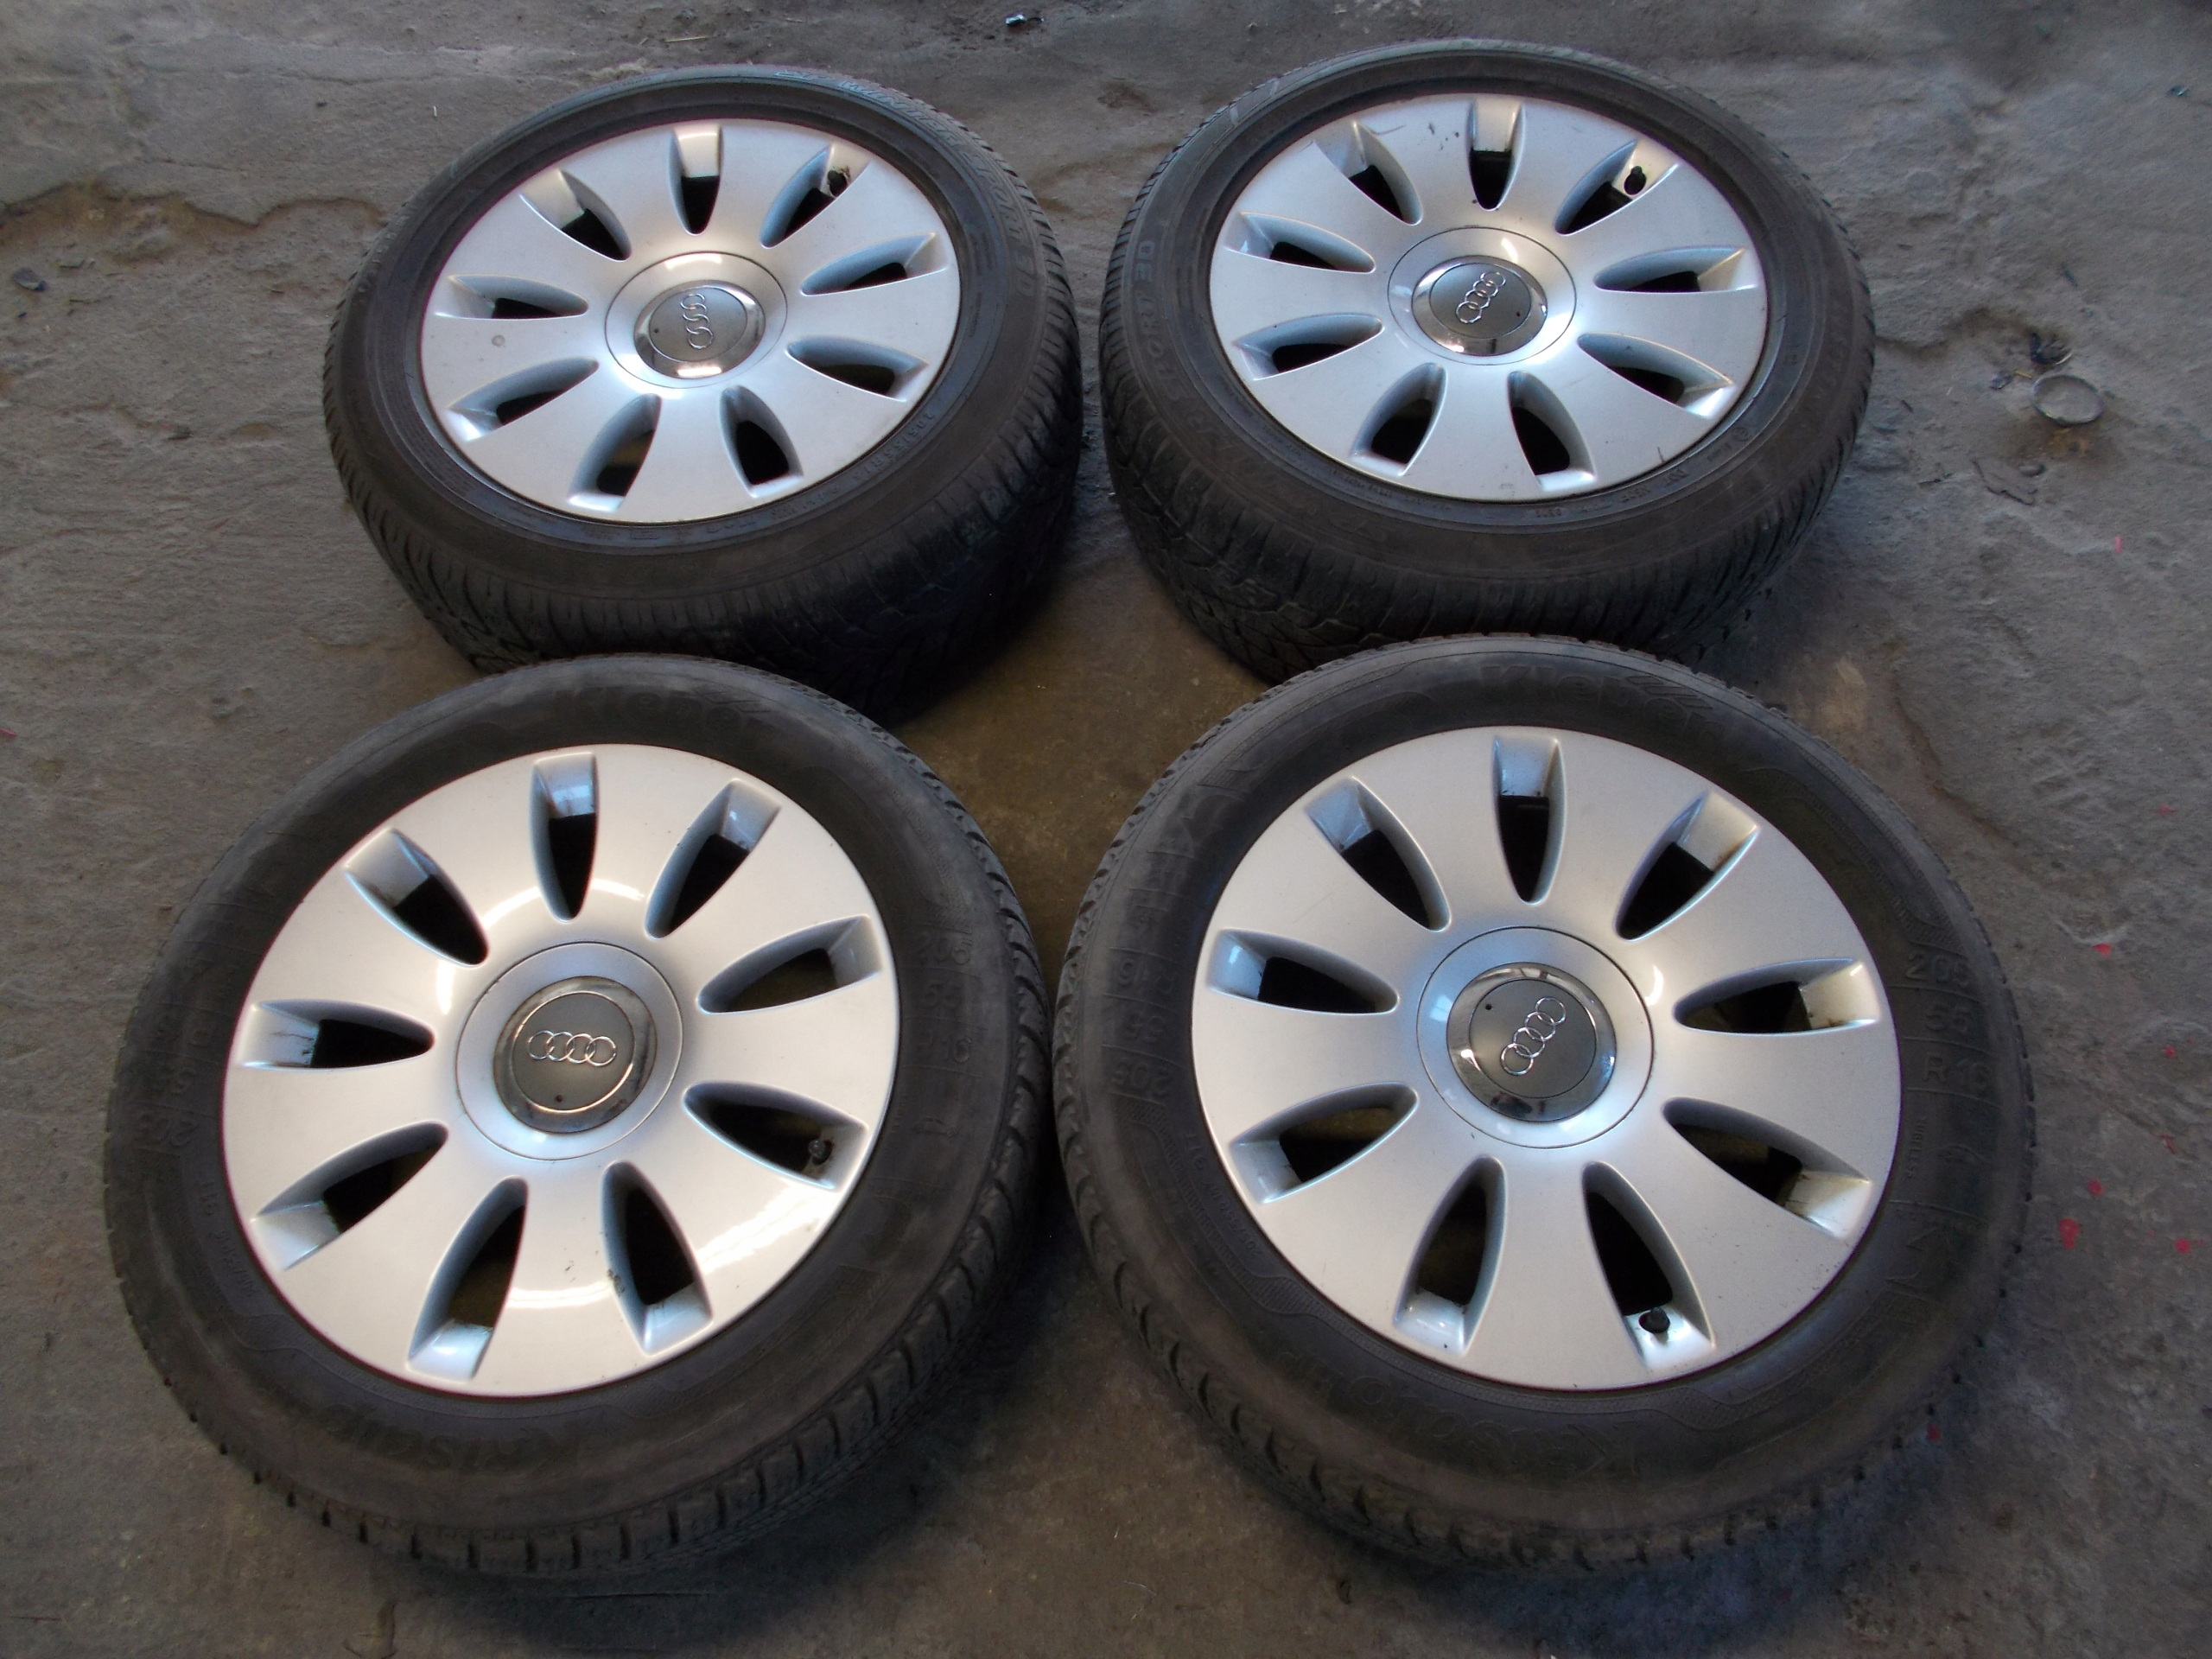 Felgi Aluminiowe Audi A6 C6 Opony Zima 16 5x112 7620951484